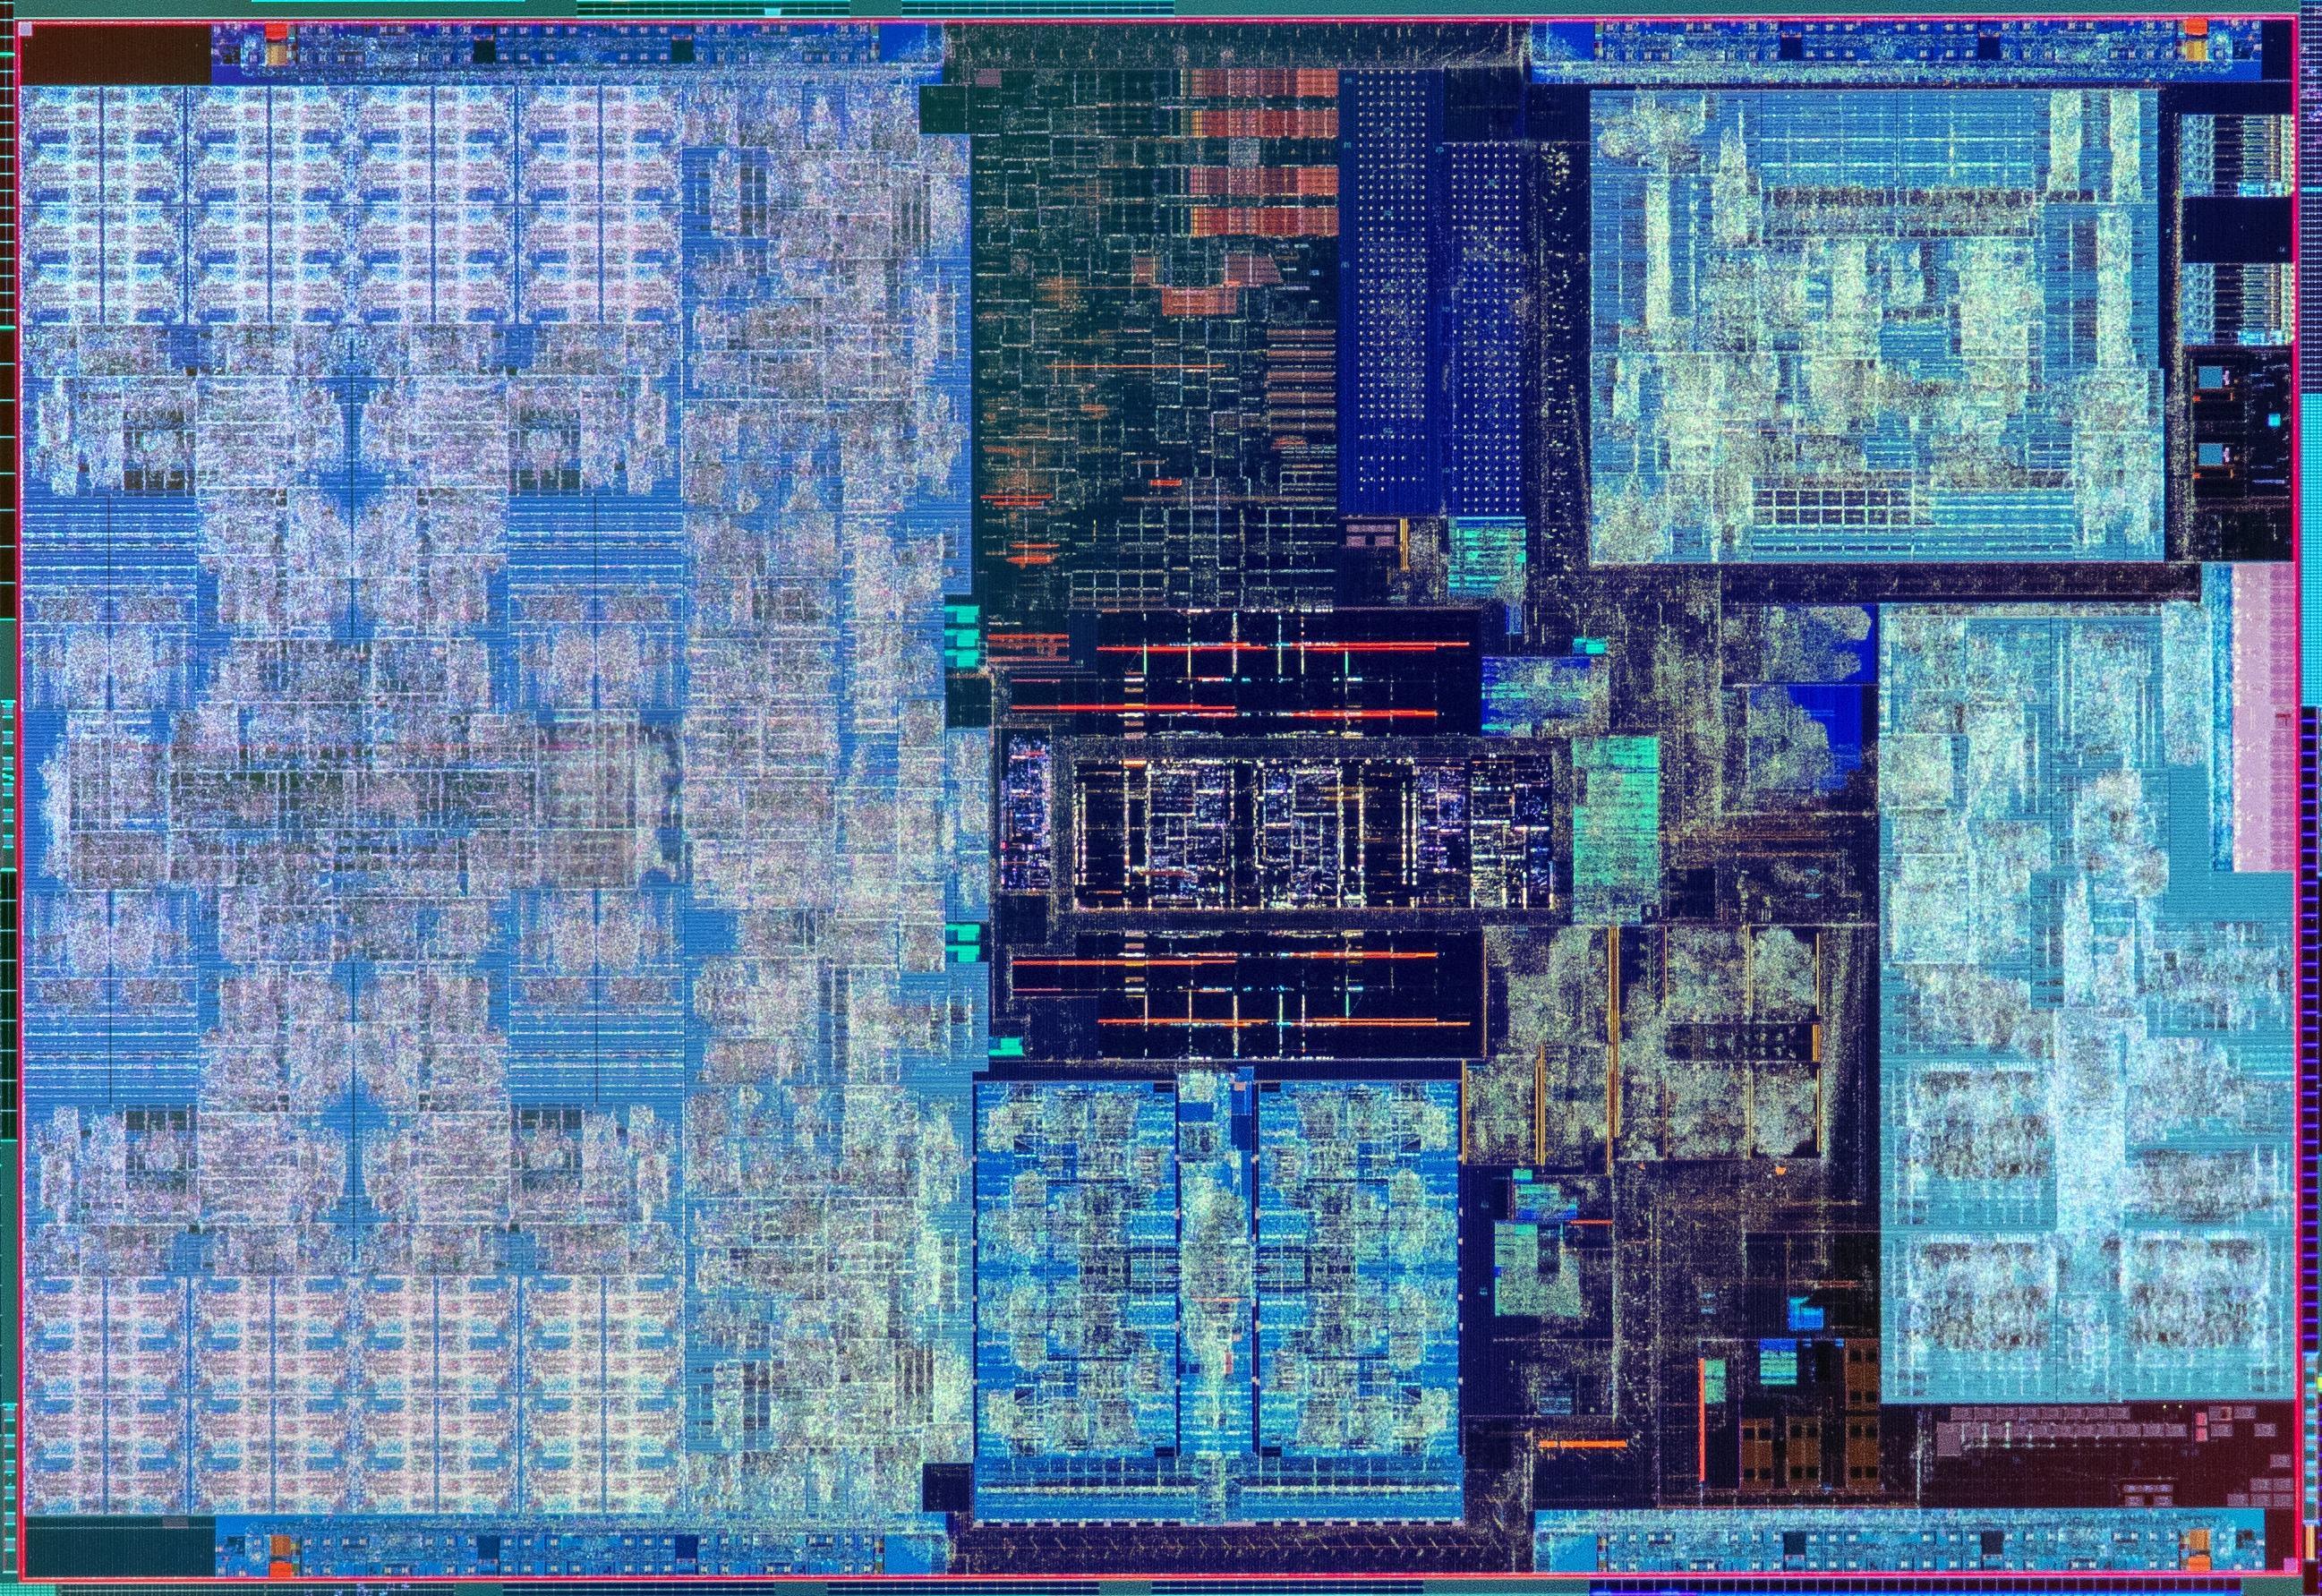 WAFER LAKEFIELD COMPUTE_RGB_V04_HighRes.jpg